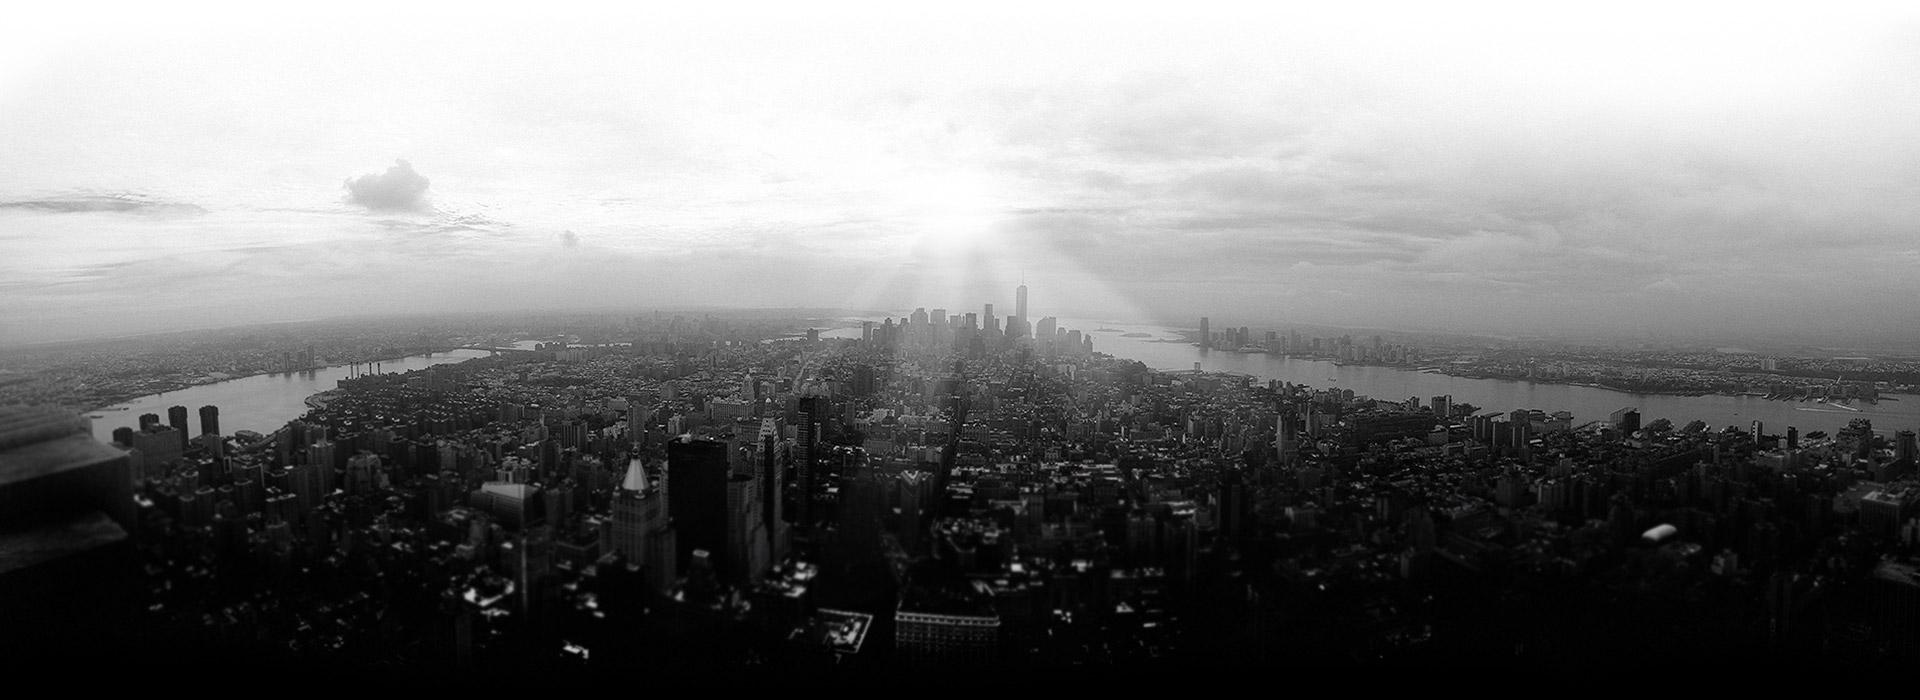 citybg.jpg